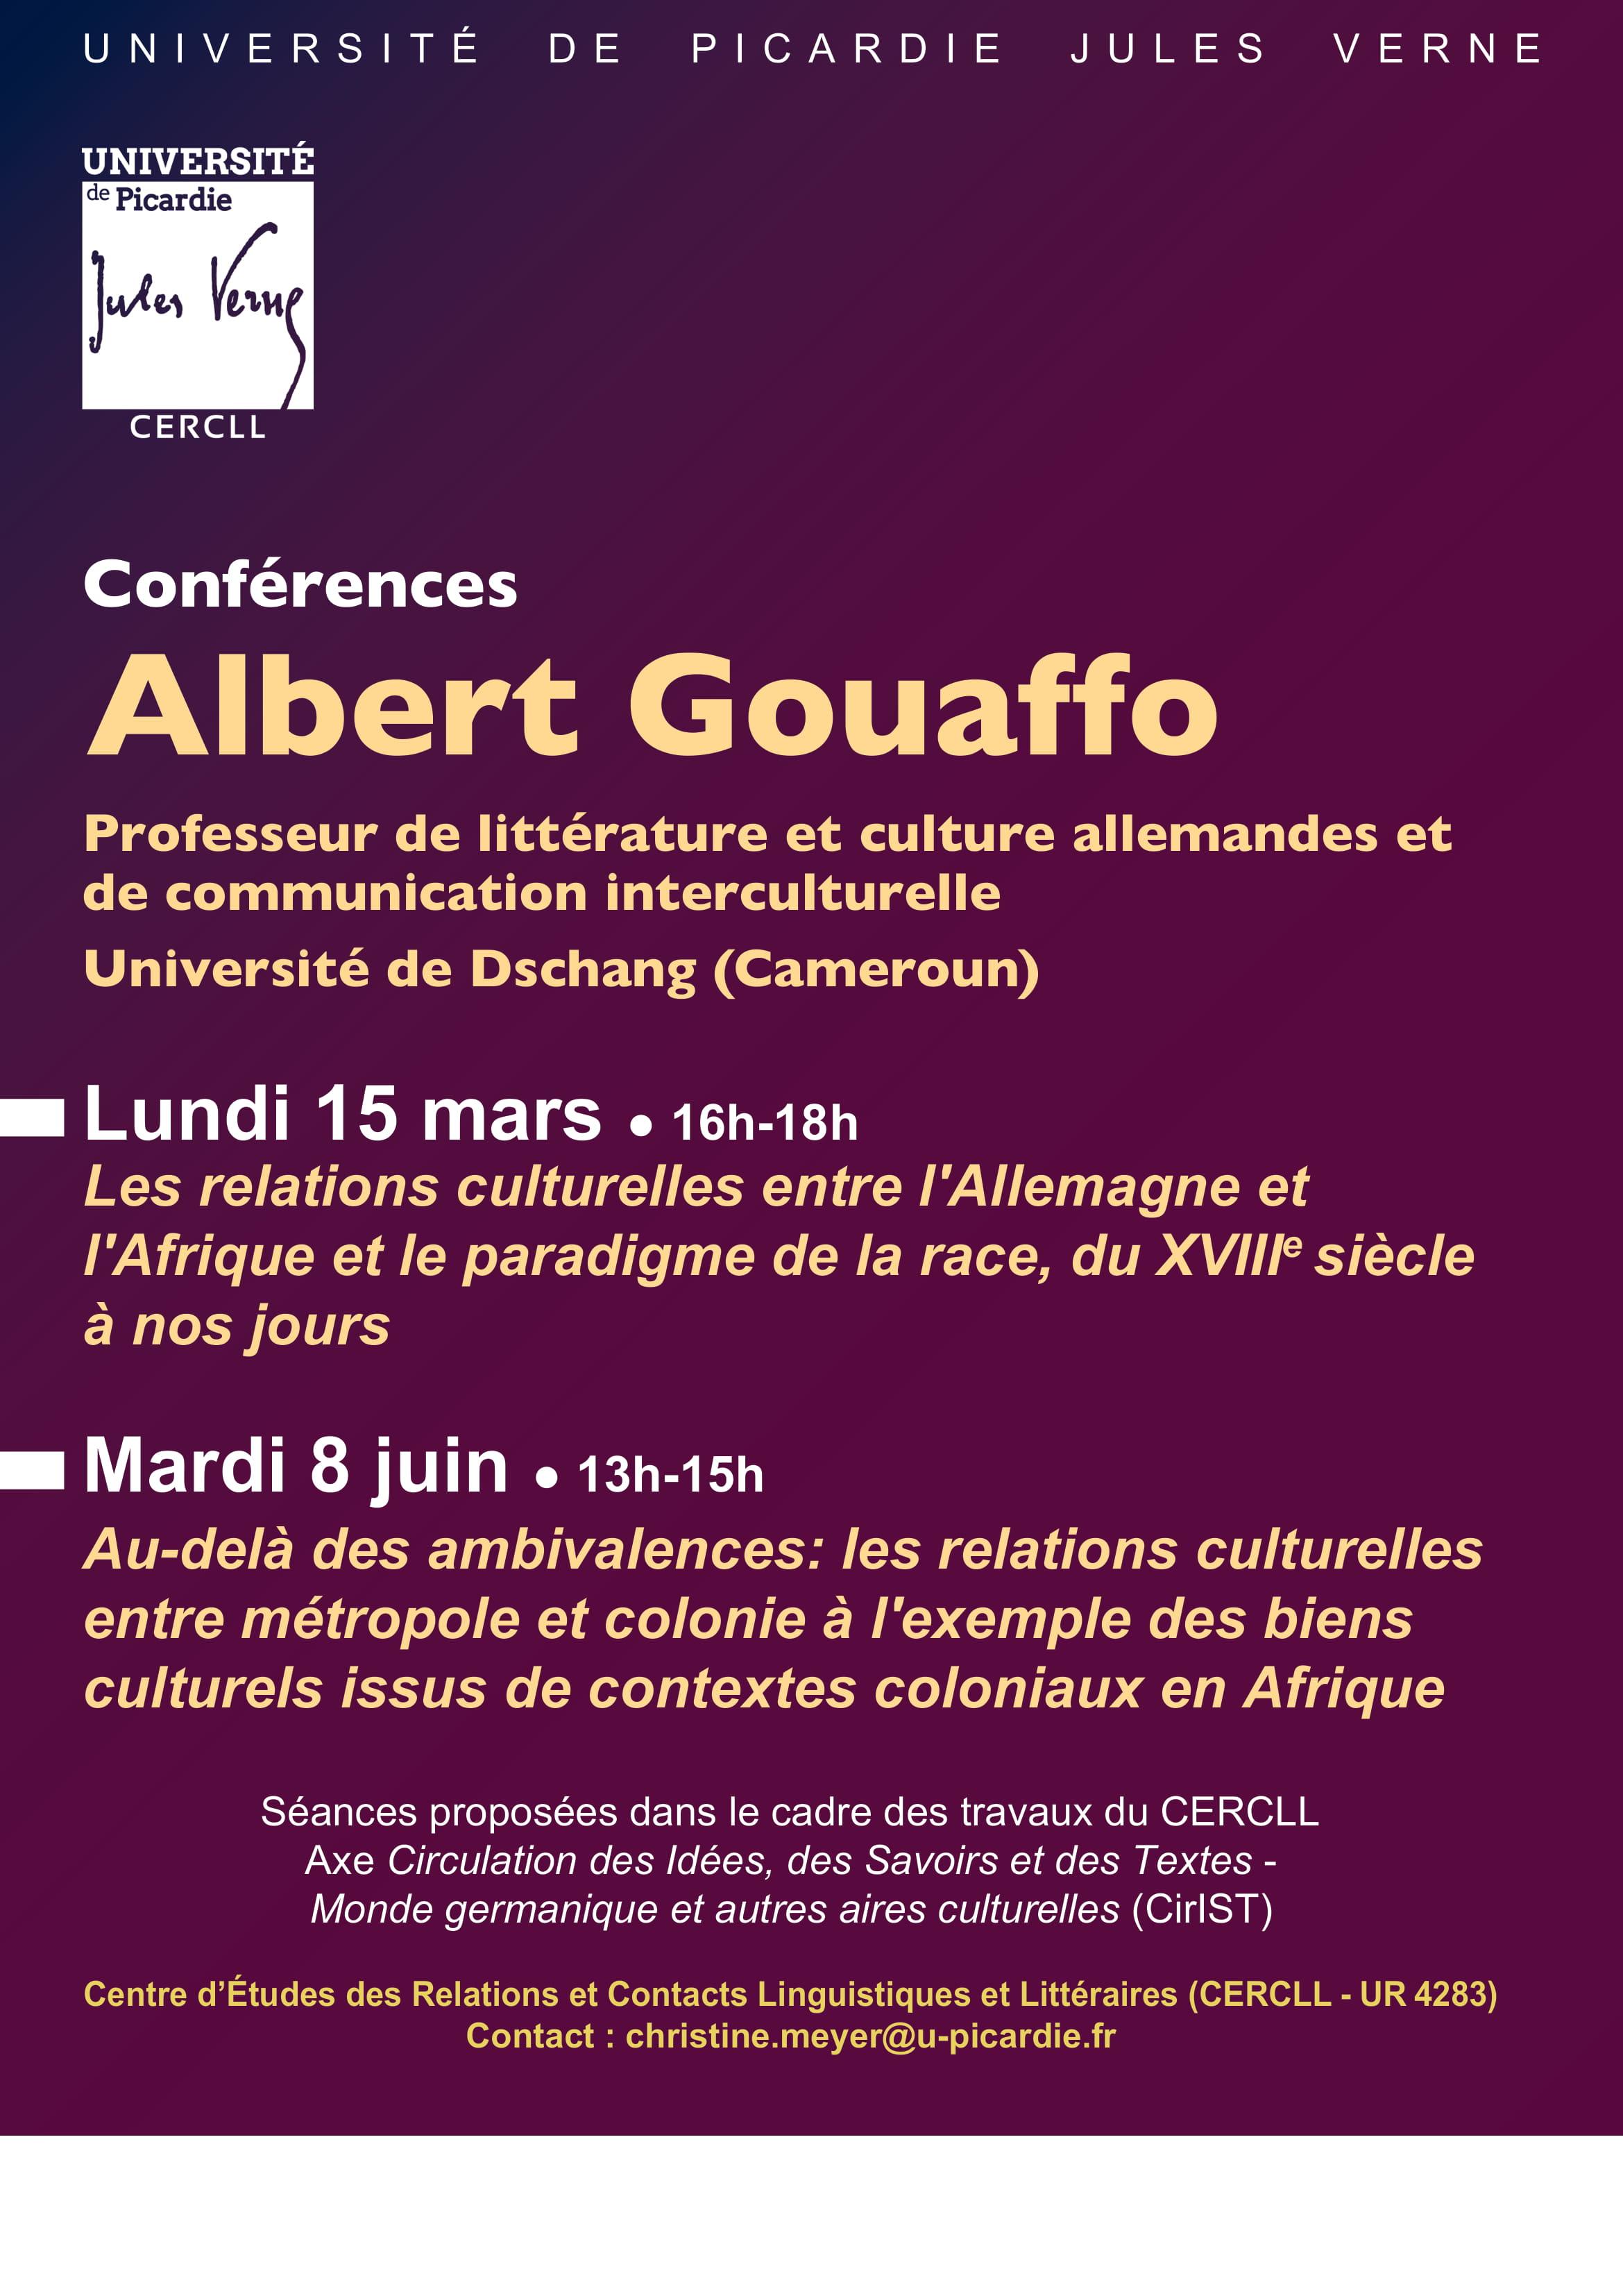 Affiche Conf GOUAFFO_2021-1 2.jpg